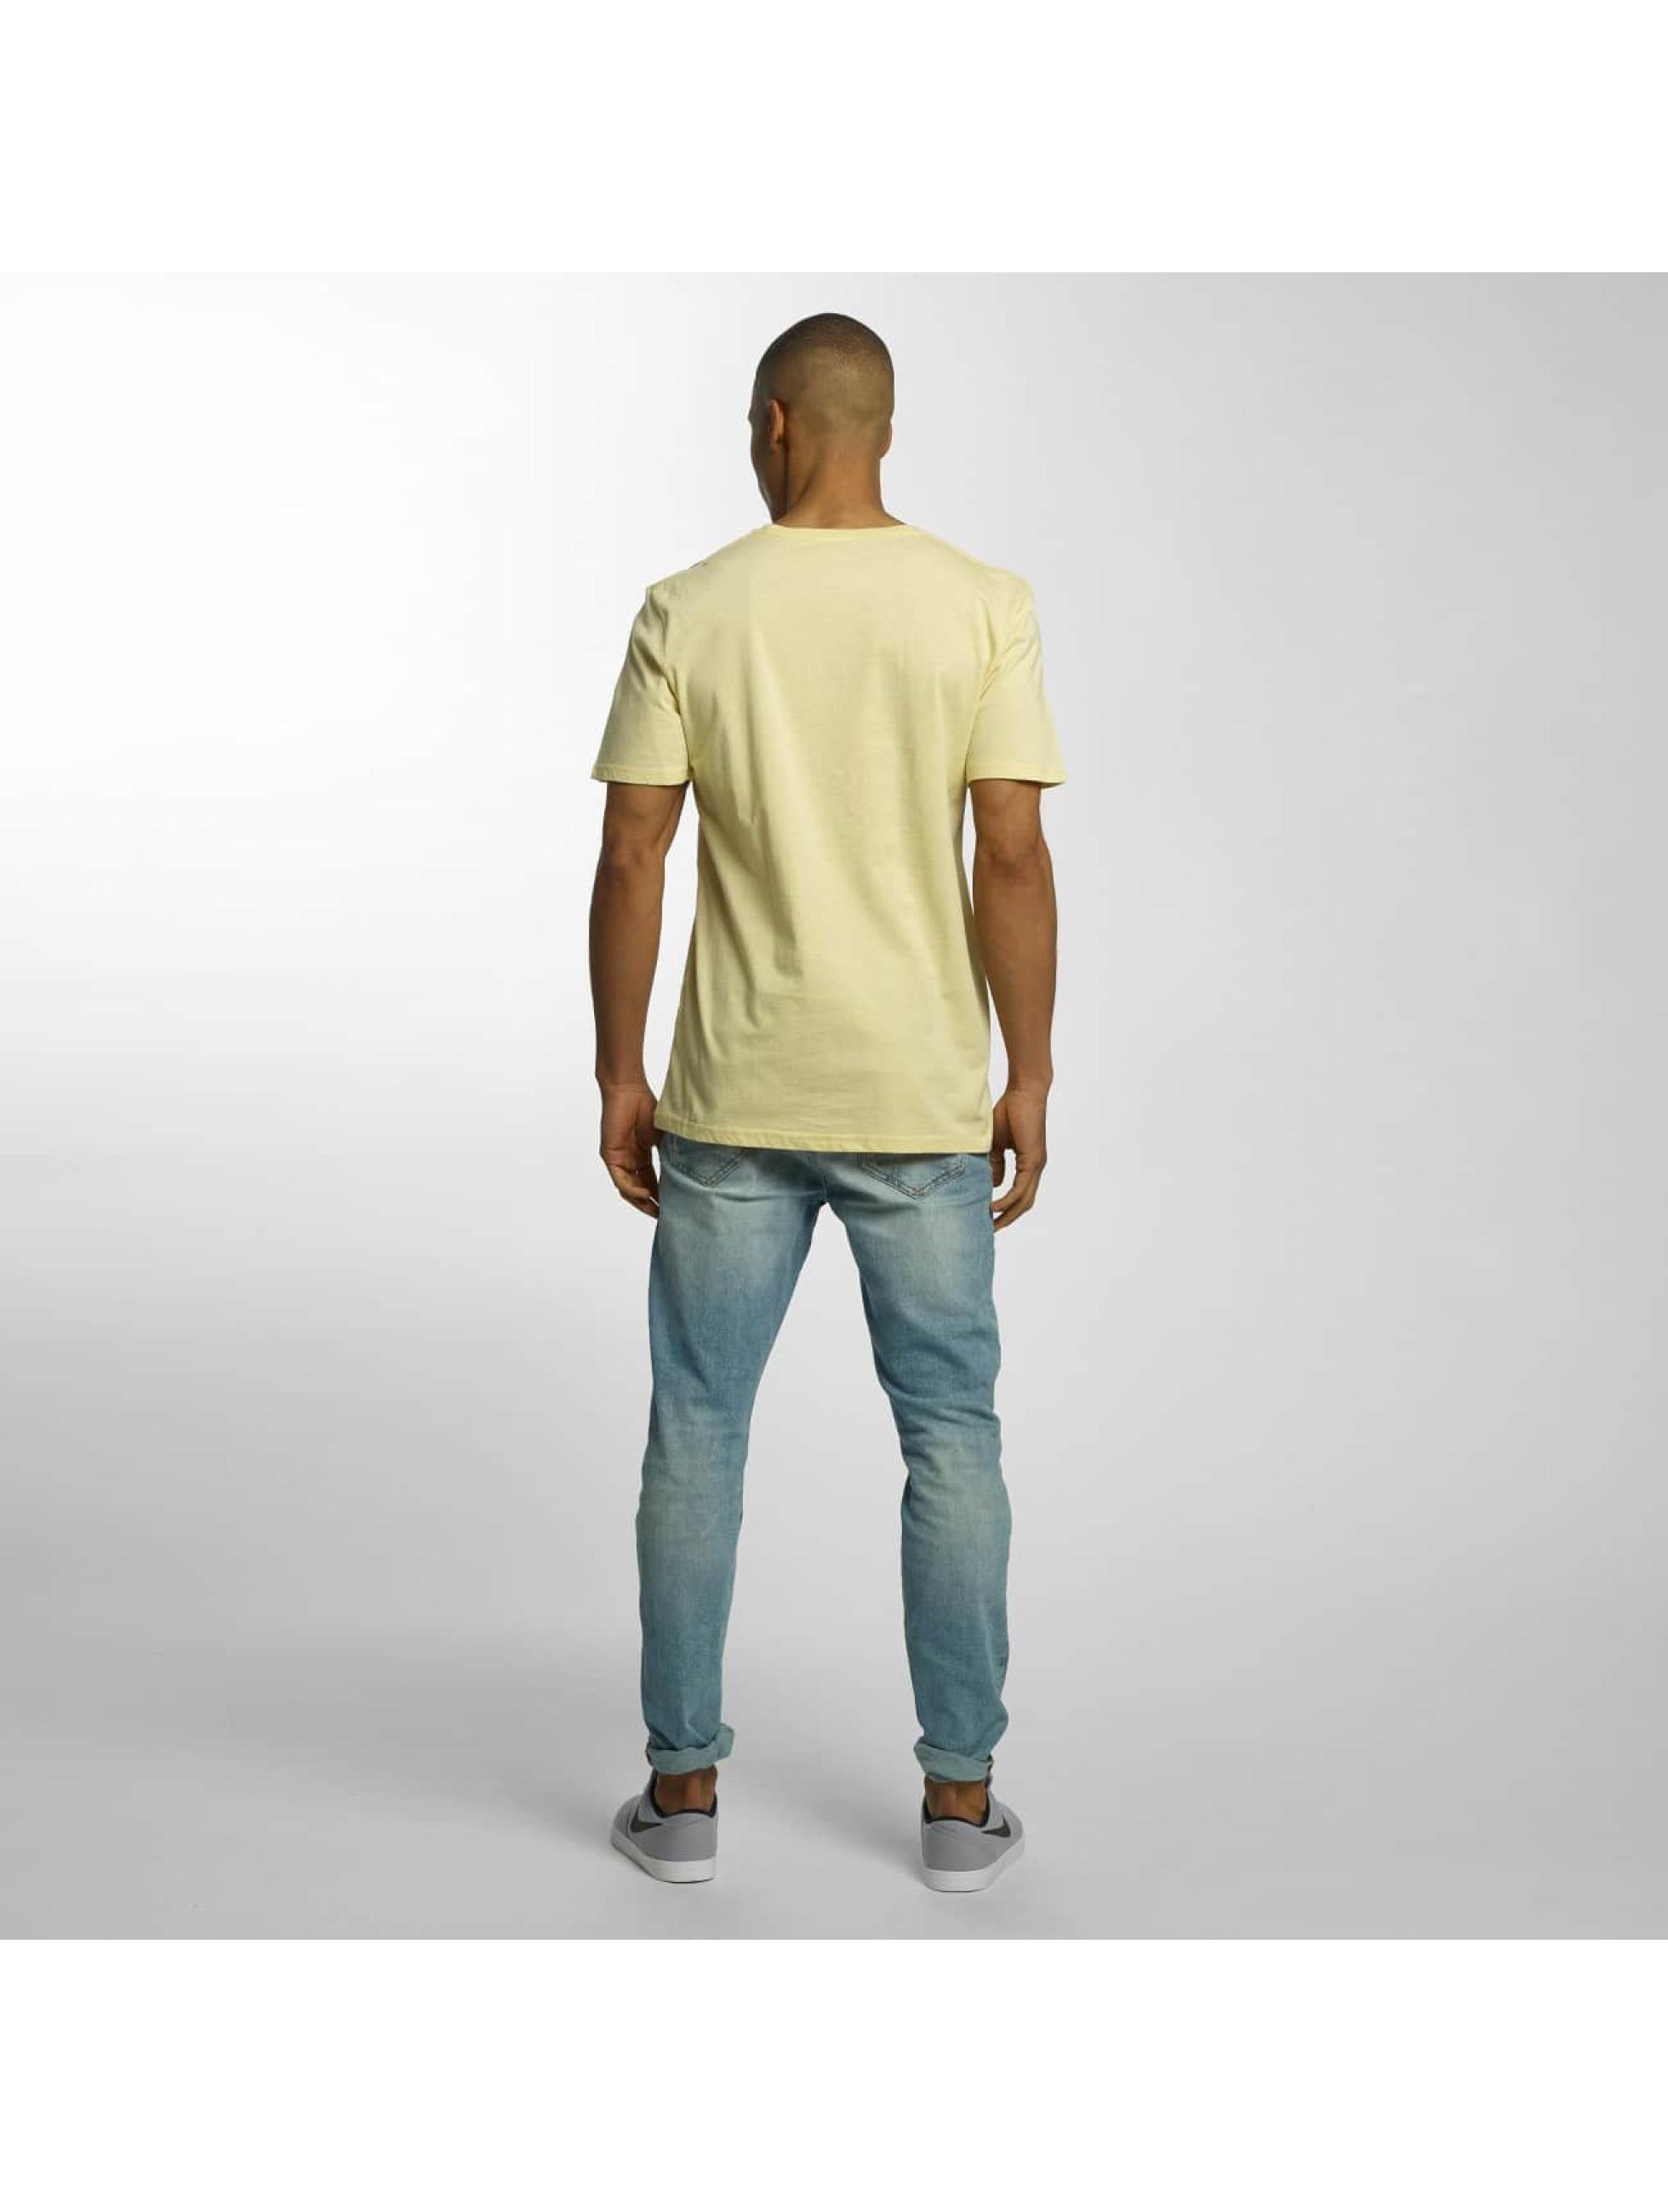 Quiksilver T-Shirt Classic Sea Tales jaune